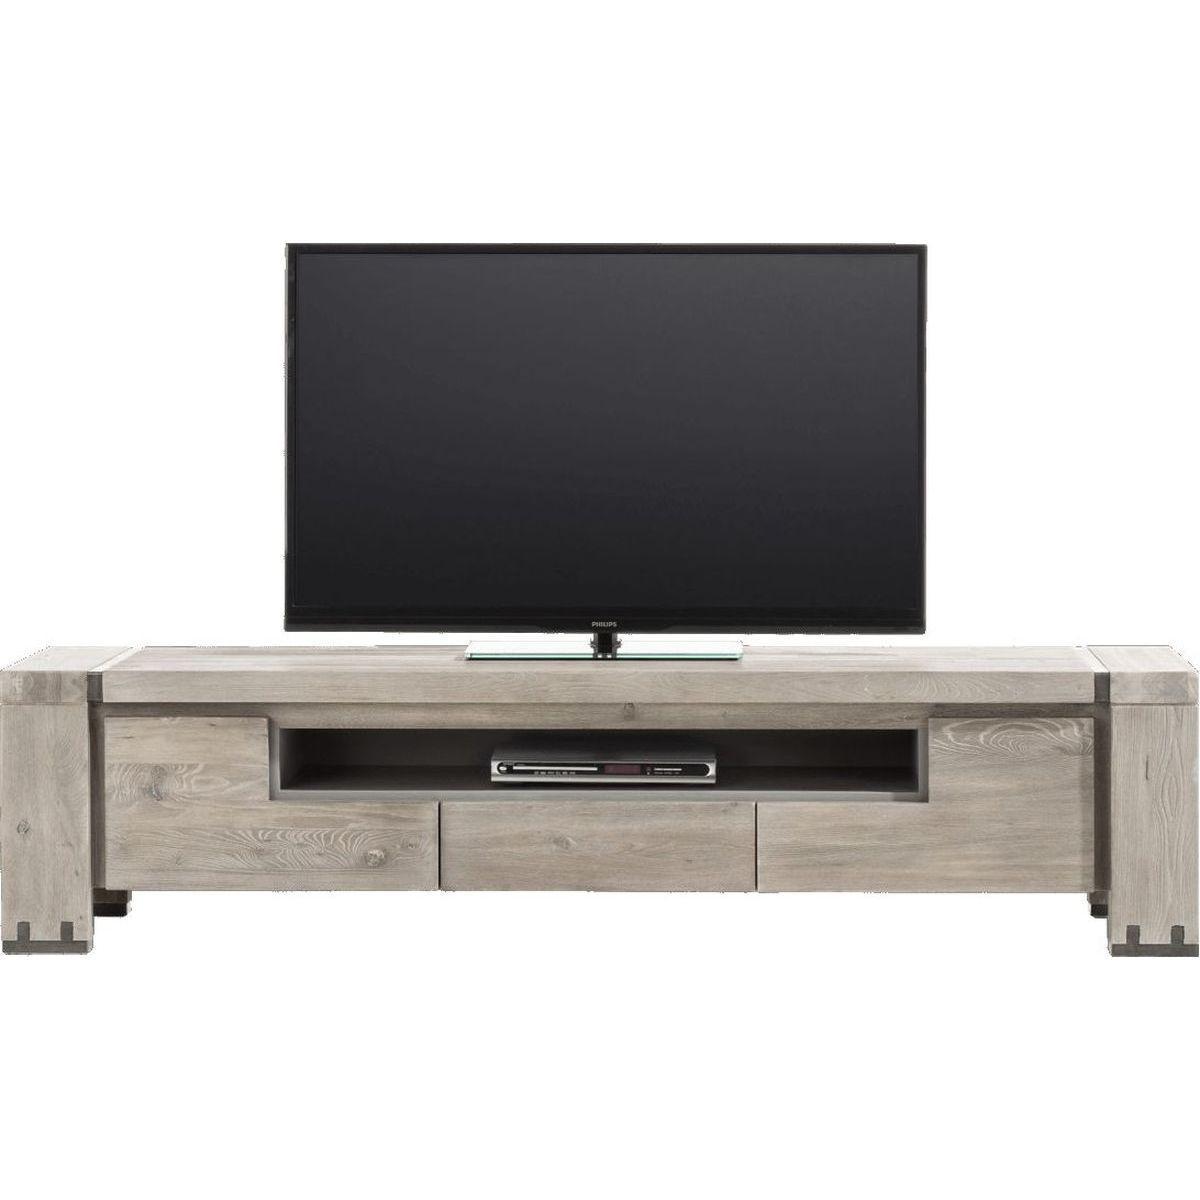 AVOLA by Henders & Hazel Meuble TV 190cm